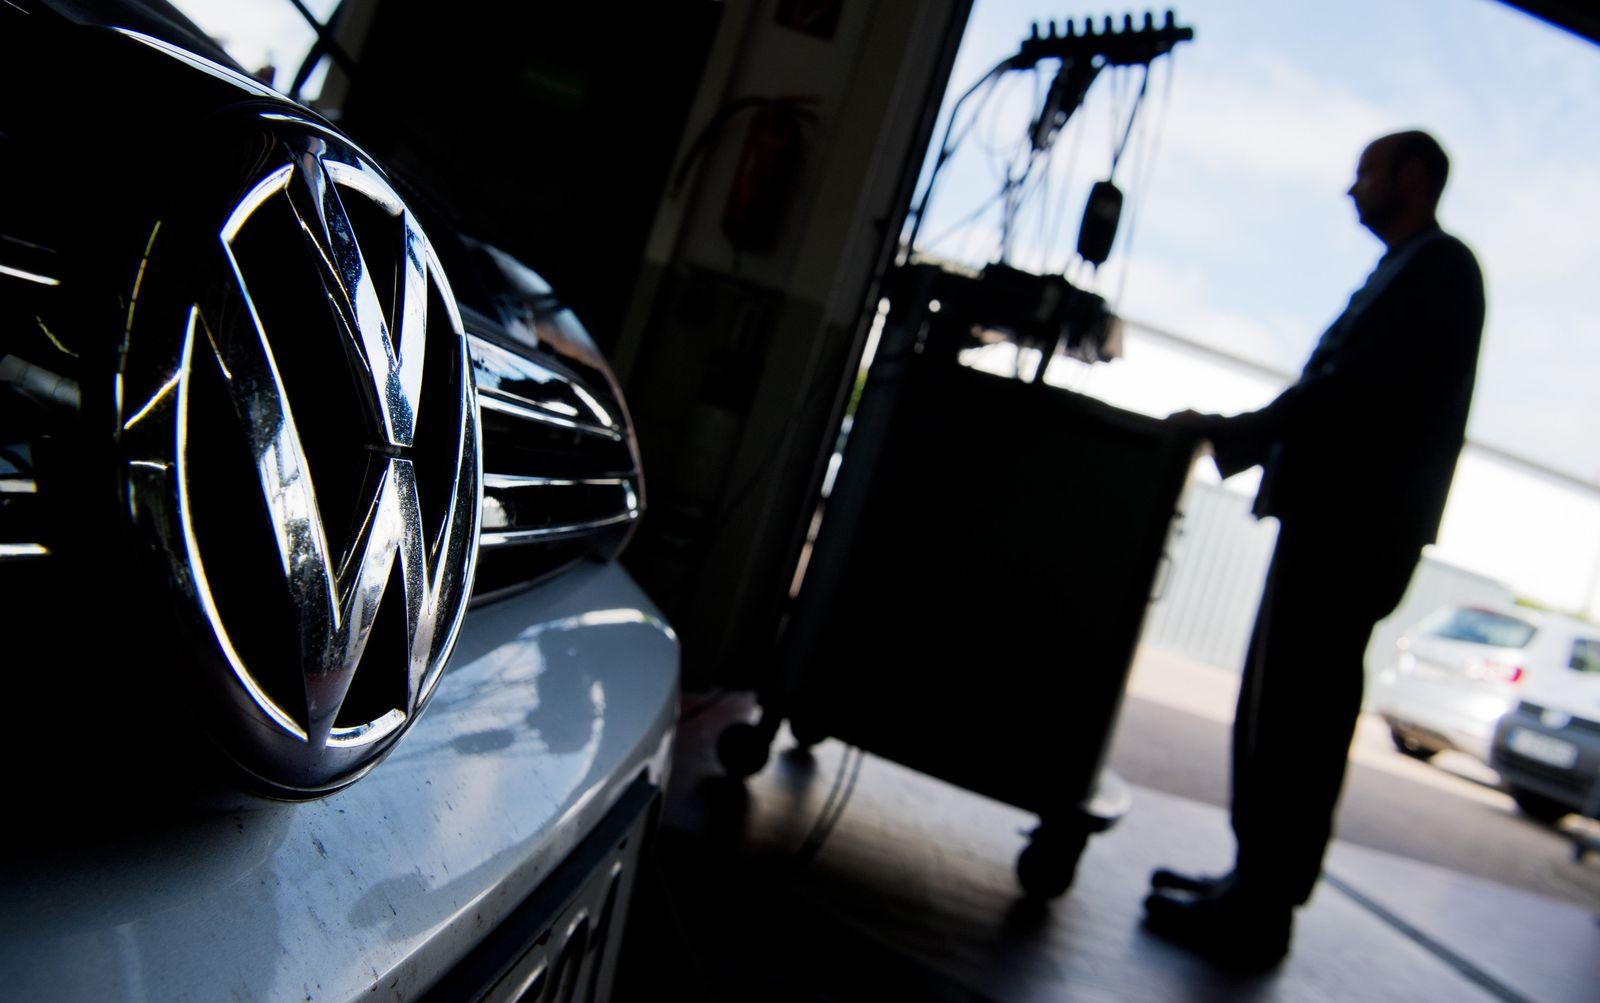 VW/ Abgasskandal/ Volkswagen - Software-Update